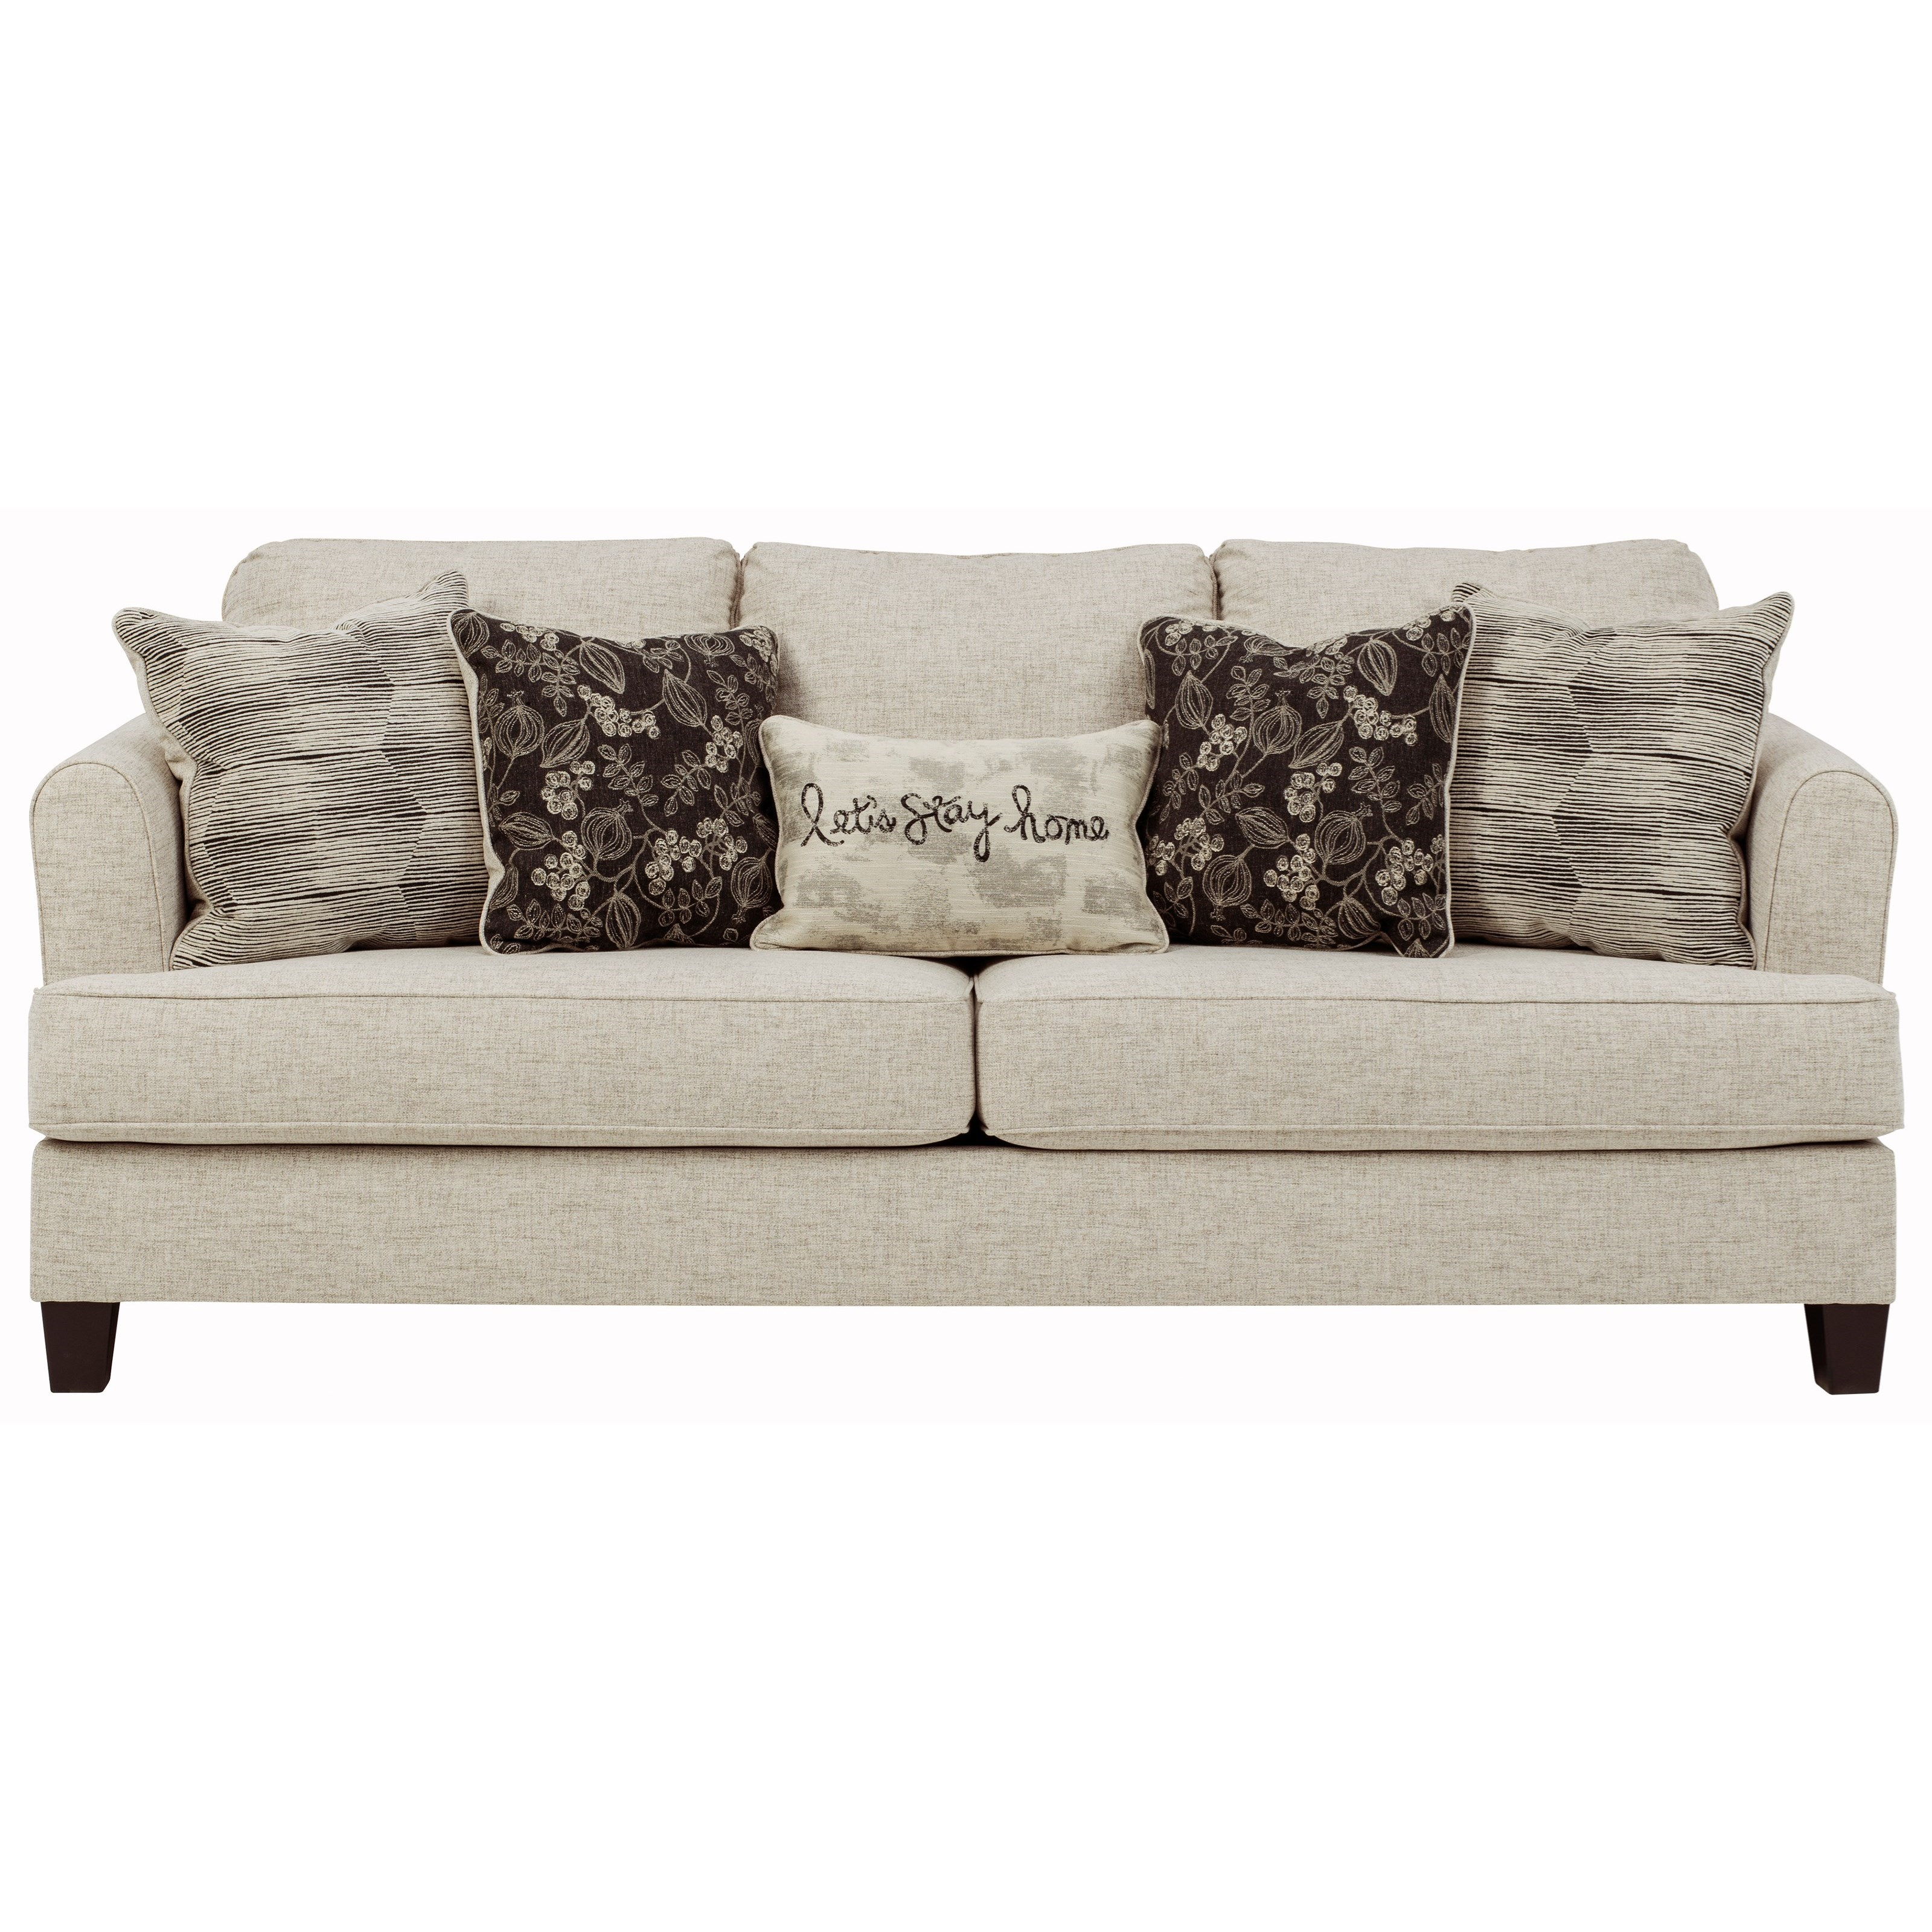 Callisburg Sofa by Benchcraft at Beck's Furniture